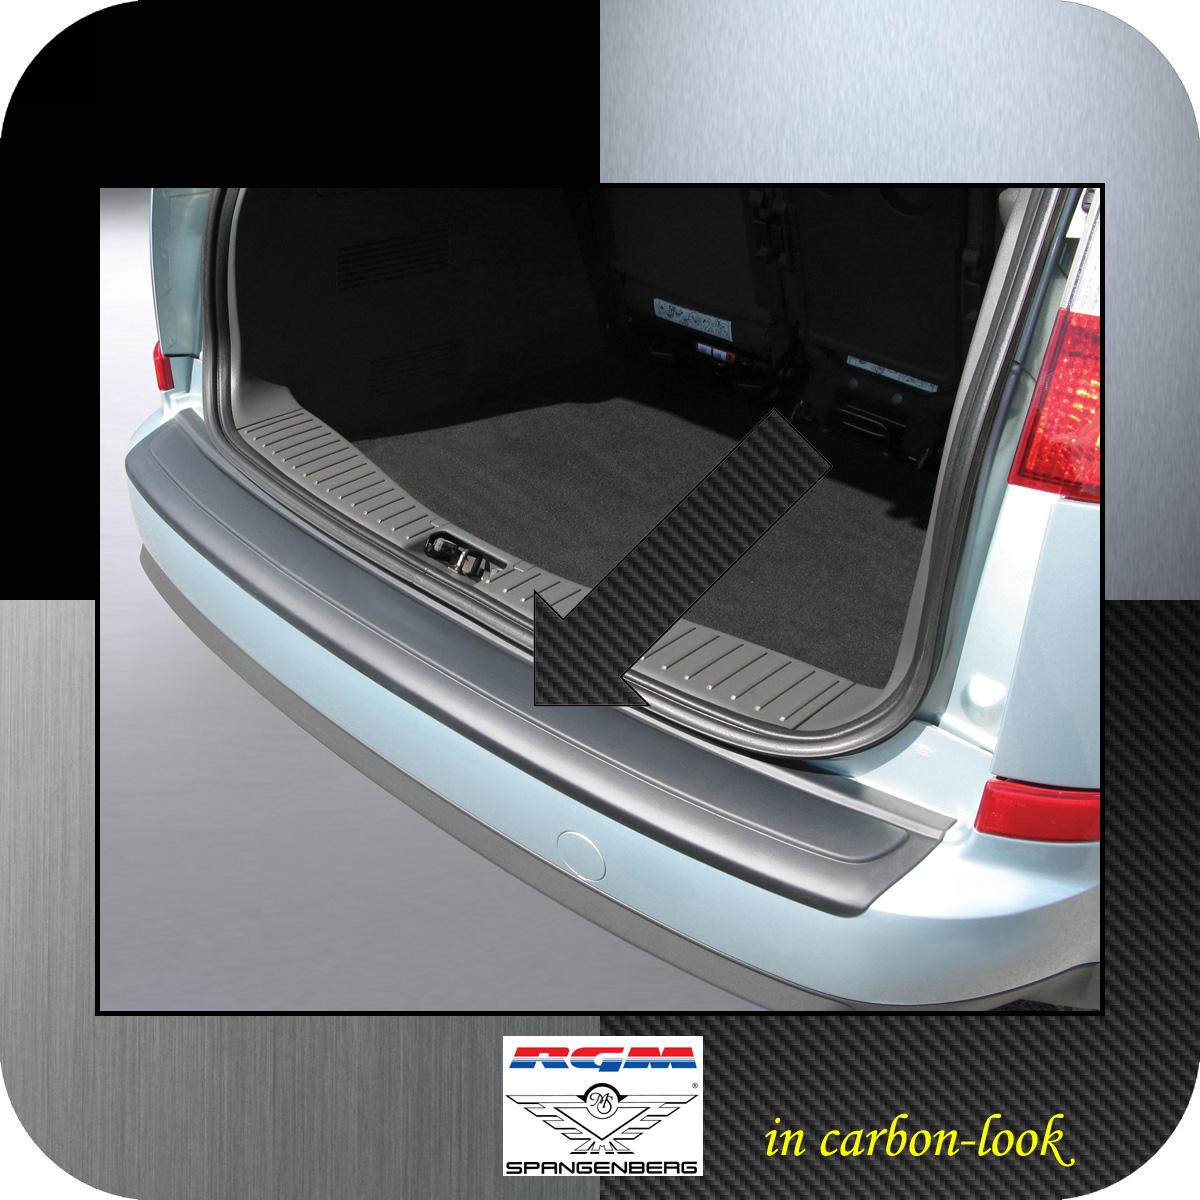 Ladekantenschutz Carbon-Look Ford C-MAX I Van Kombi ab facelift 2007-10 3509175